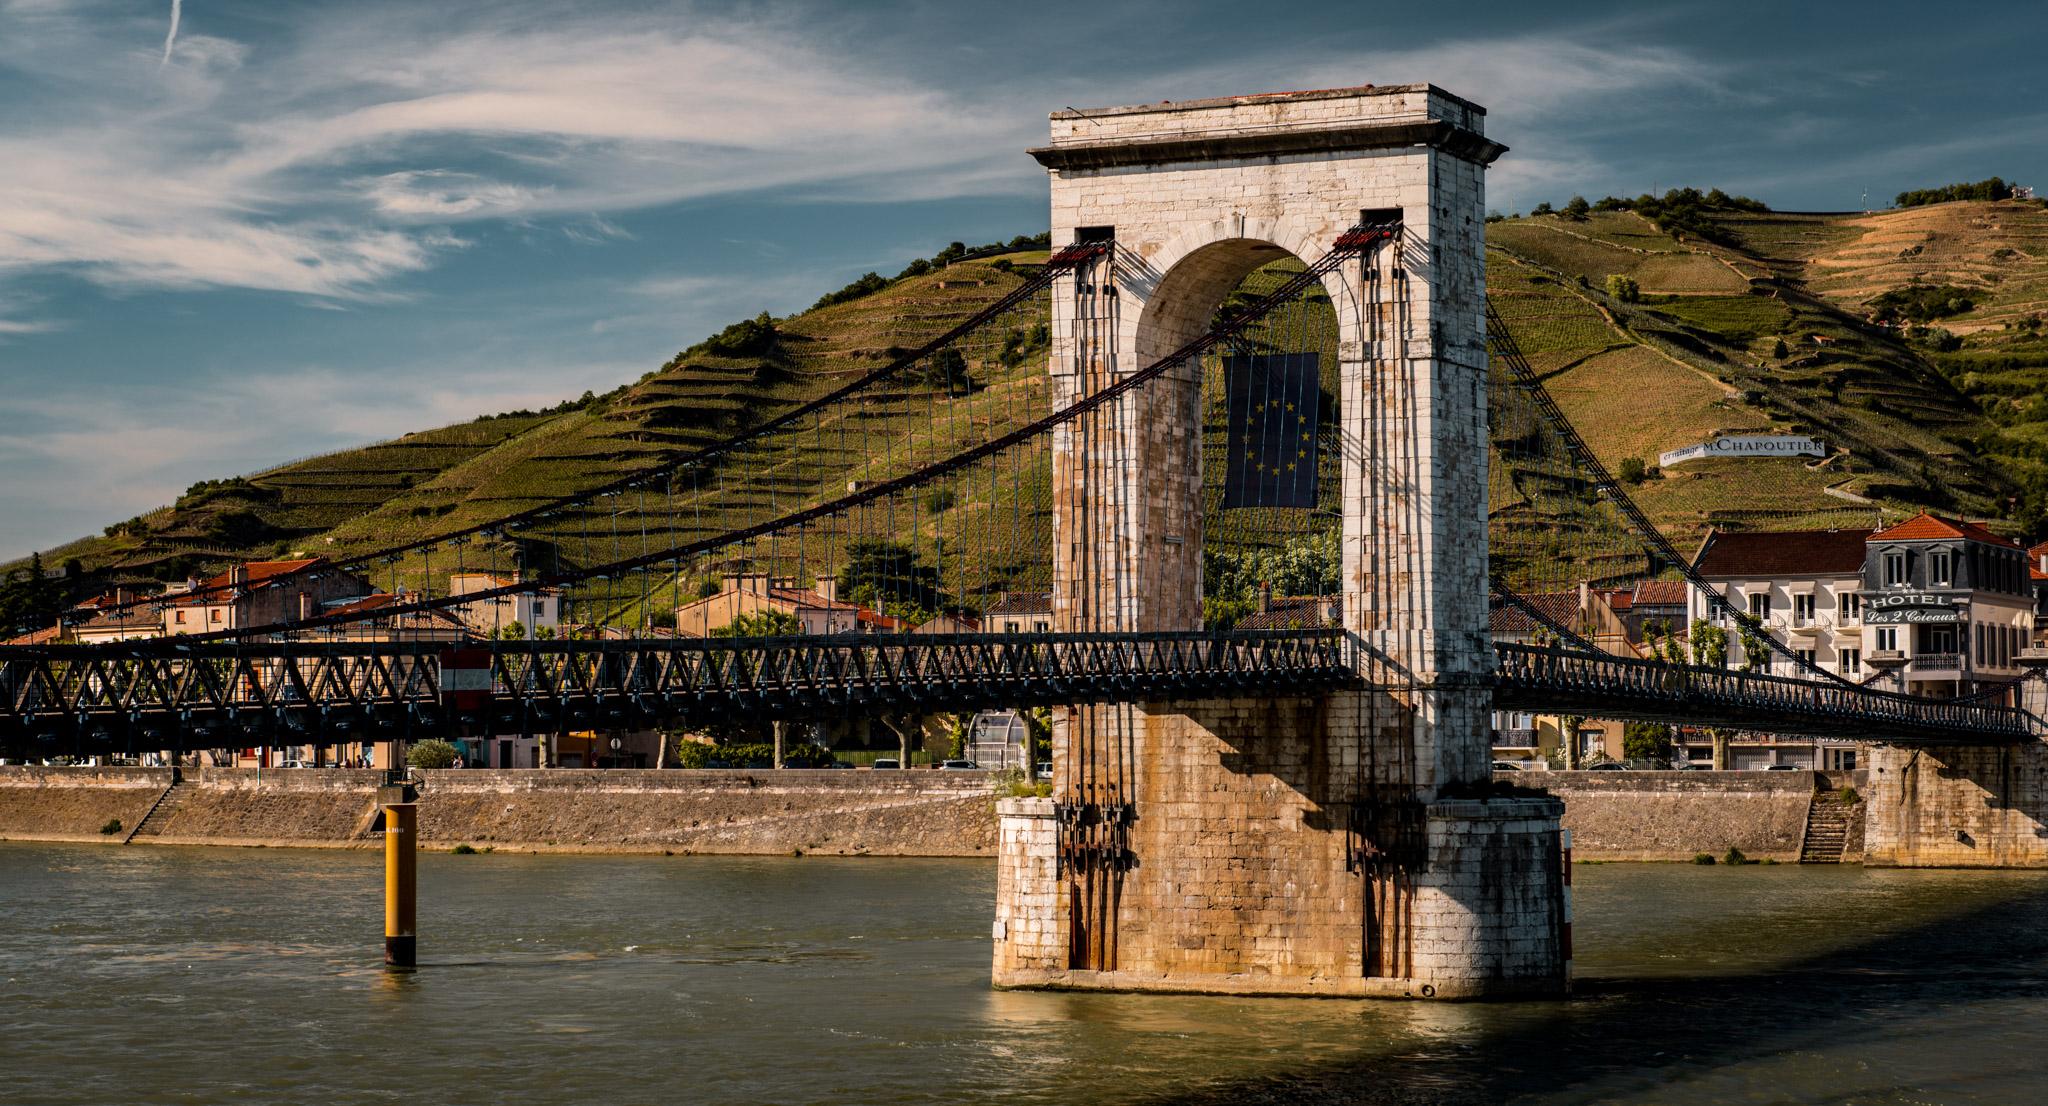 France : Northern Rhone : Pedestrian bridge connecting Tain l'Hermitage and Tournon-sur-Rhone